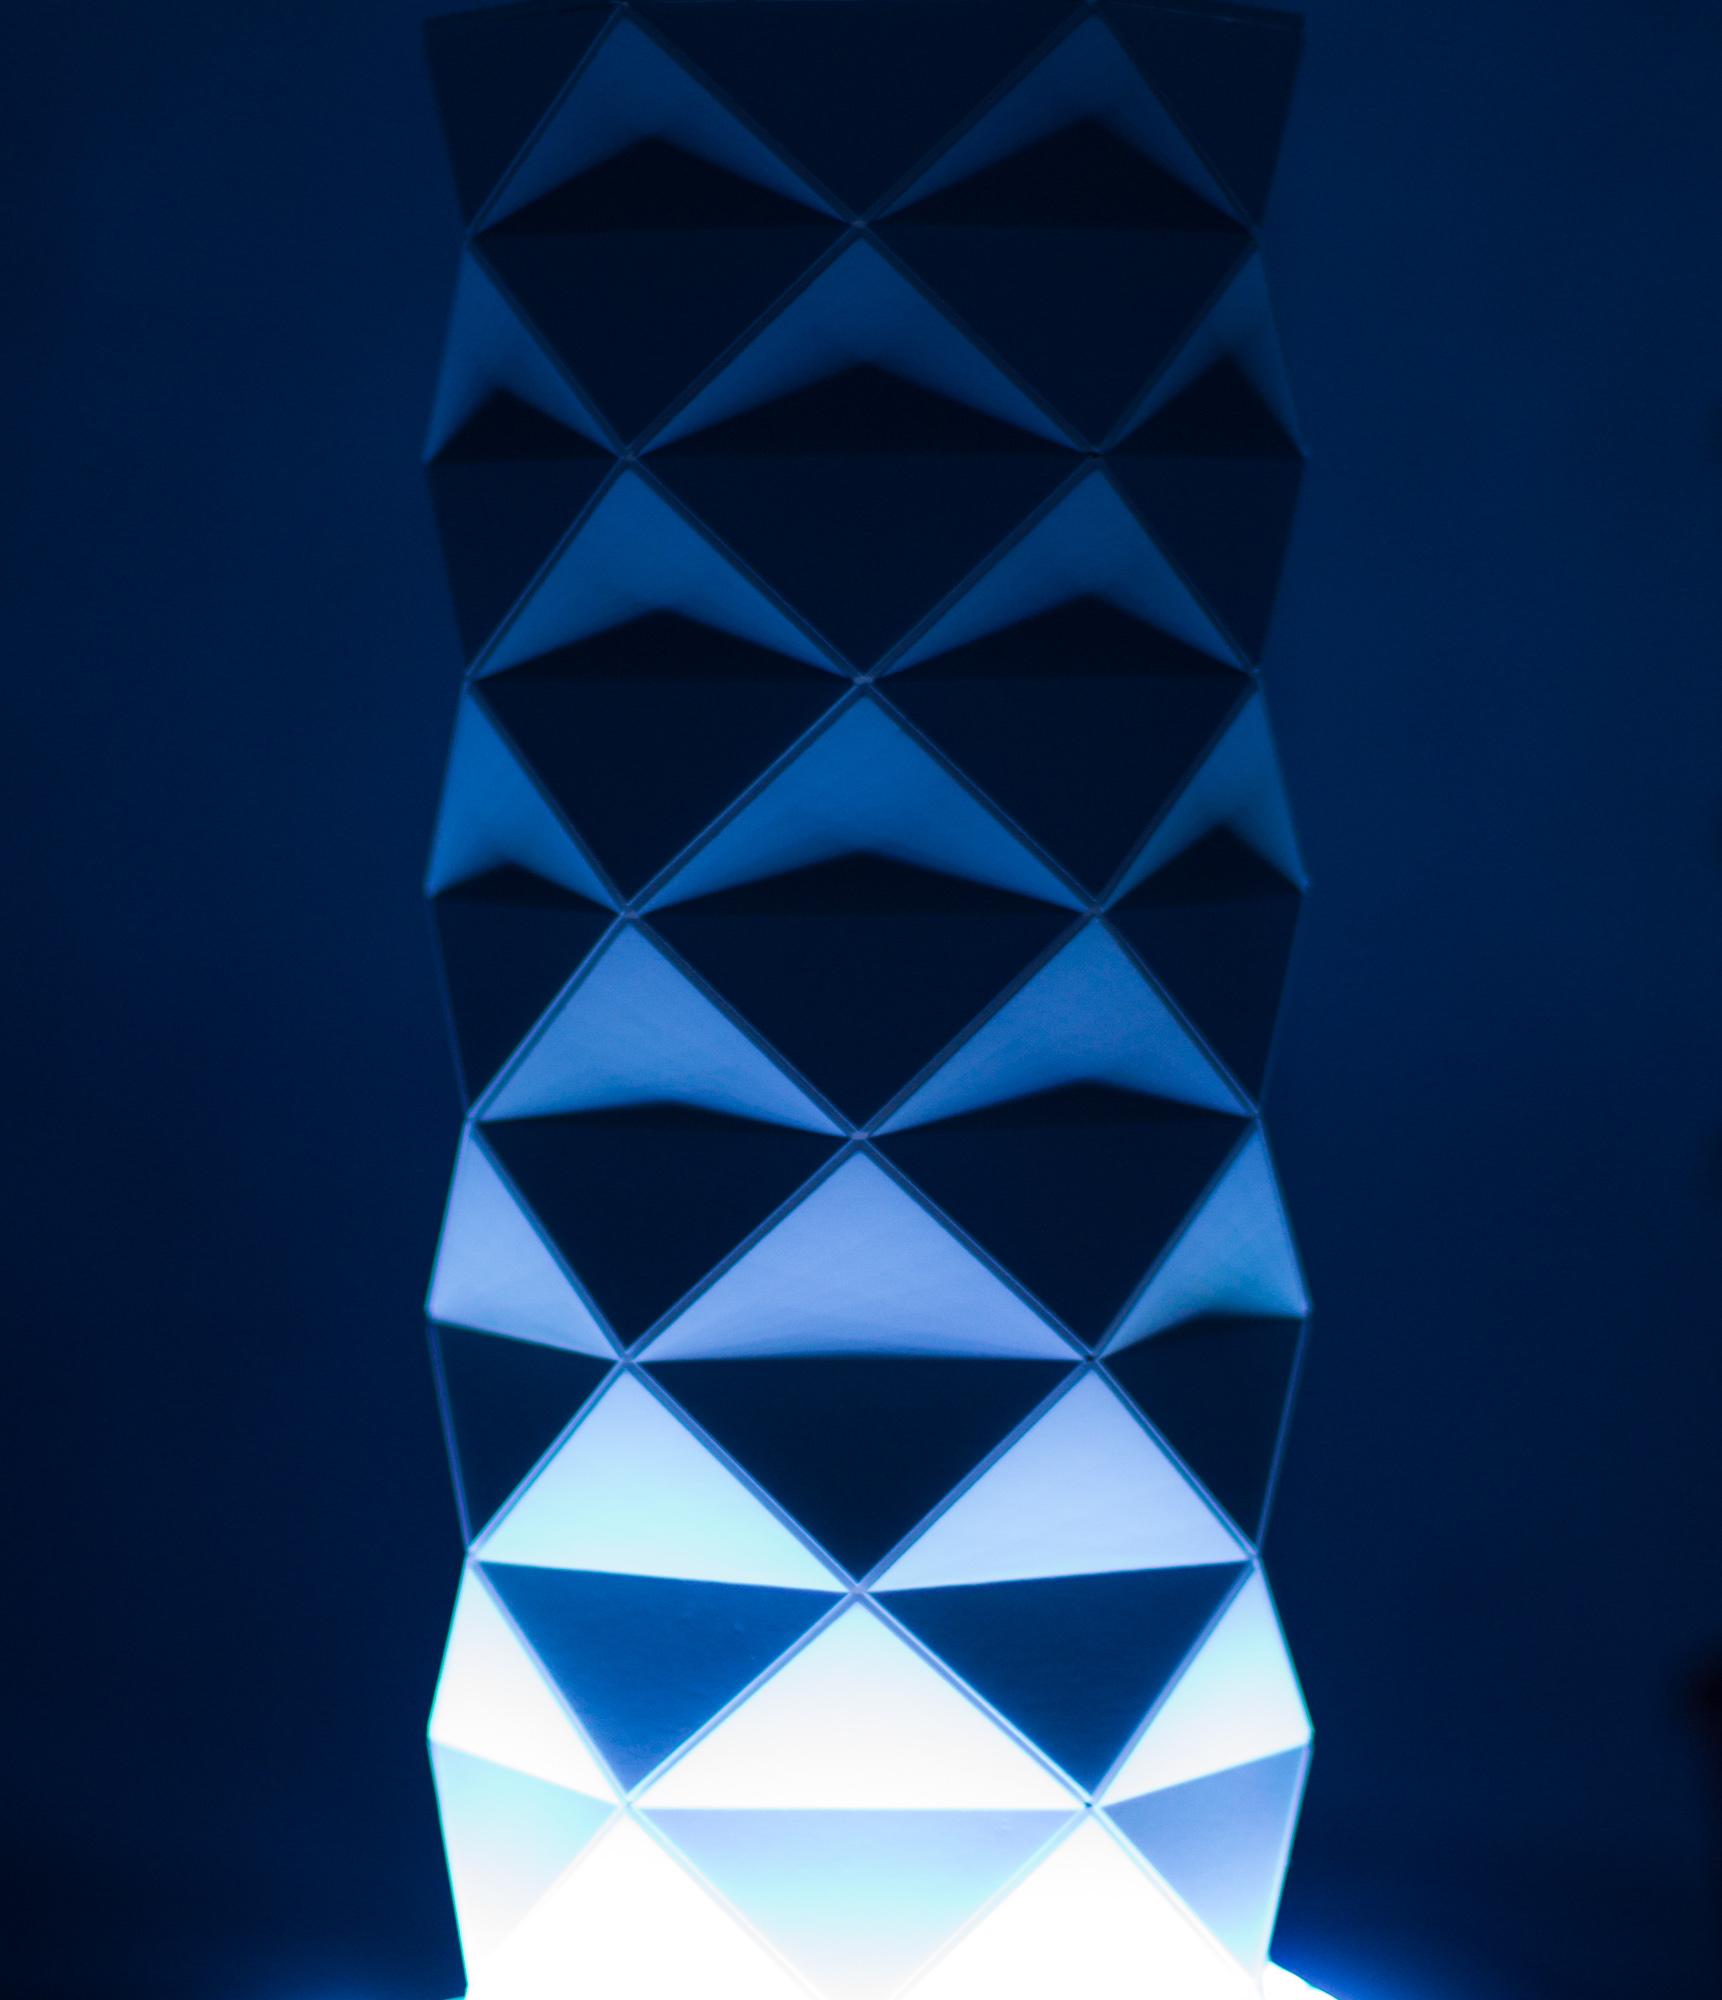 Digitale Prototype Prototype Led Digitale Lampe Lampe De Led De Prototype D2I9EH